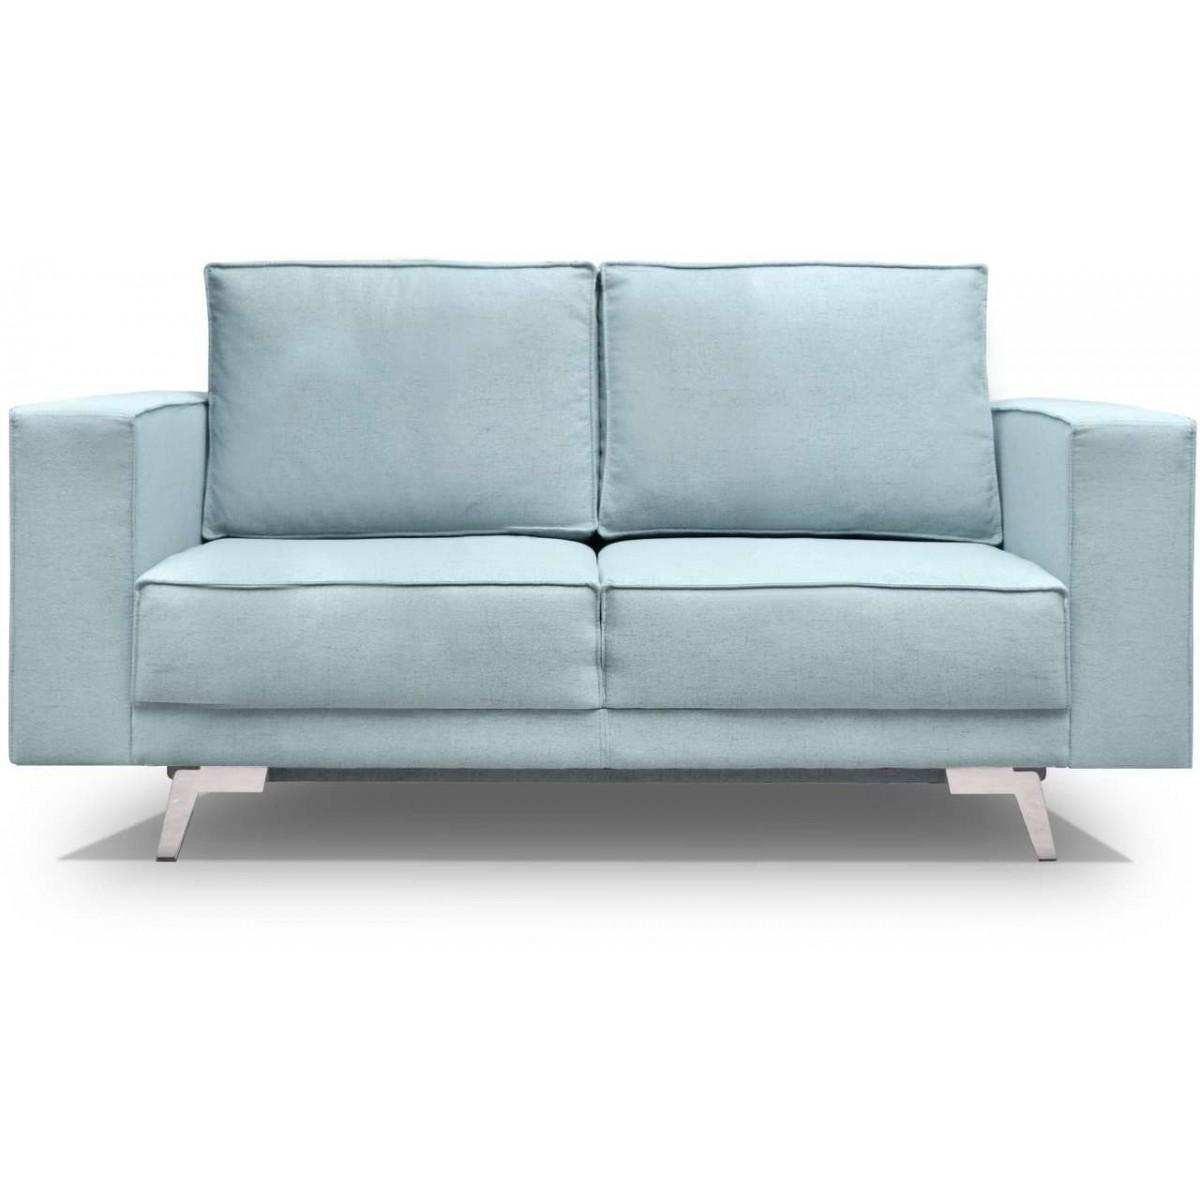 Malmo 2 osobowa Sofa